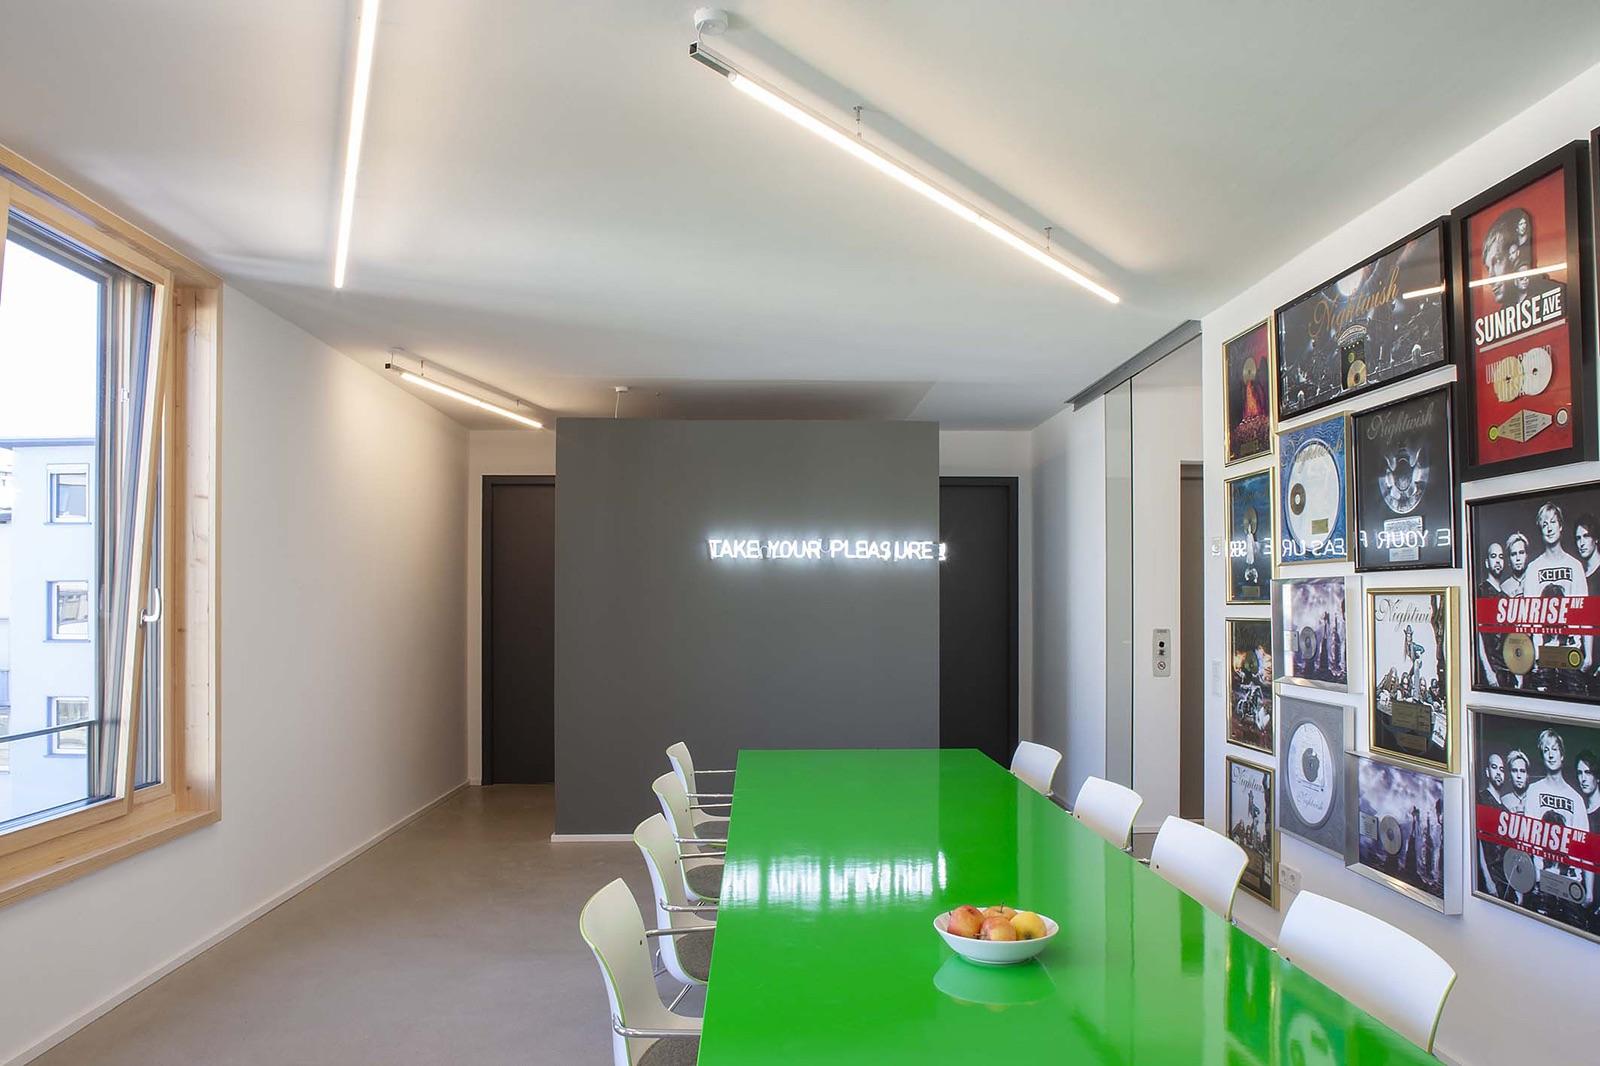 contra-bochum-office-11